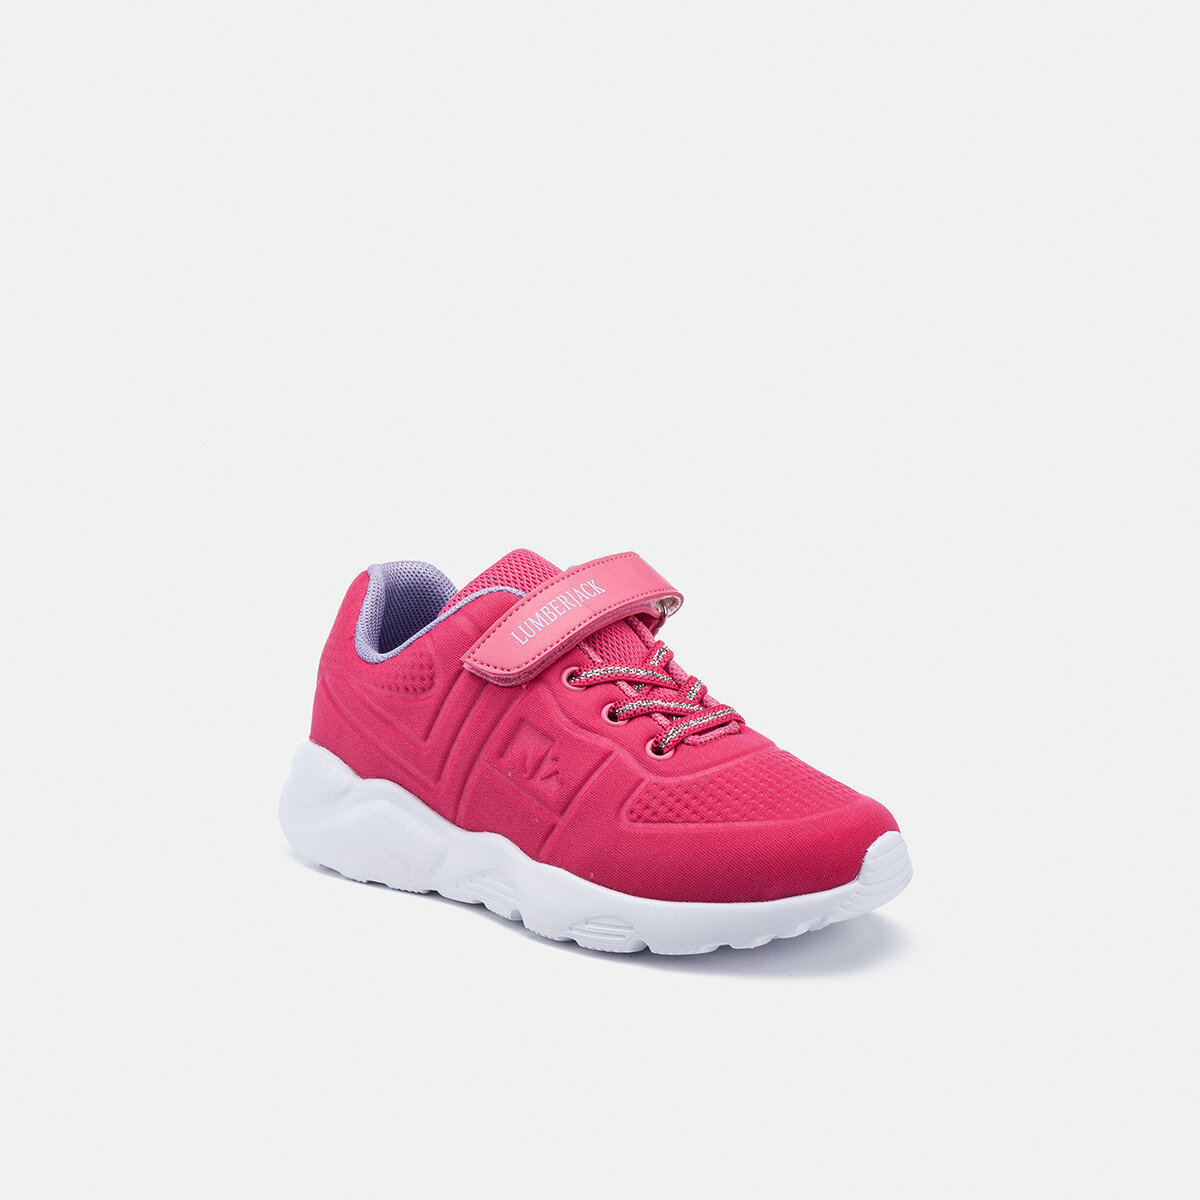 BULL FUXIA Girl Running shoes